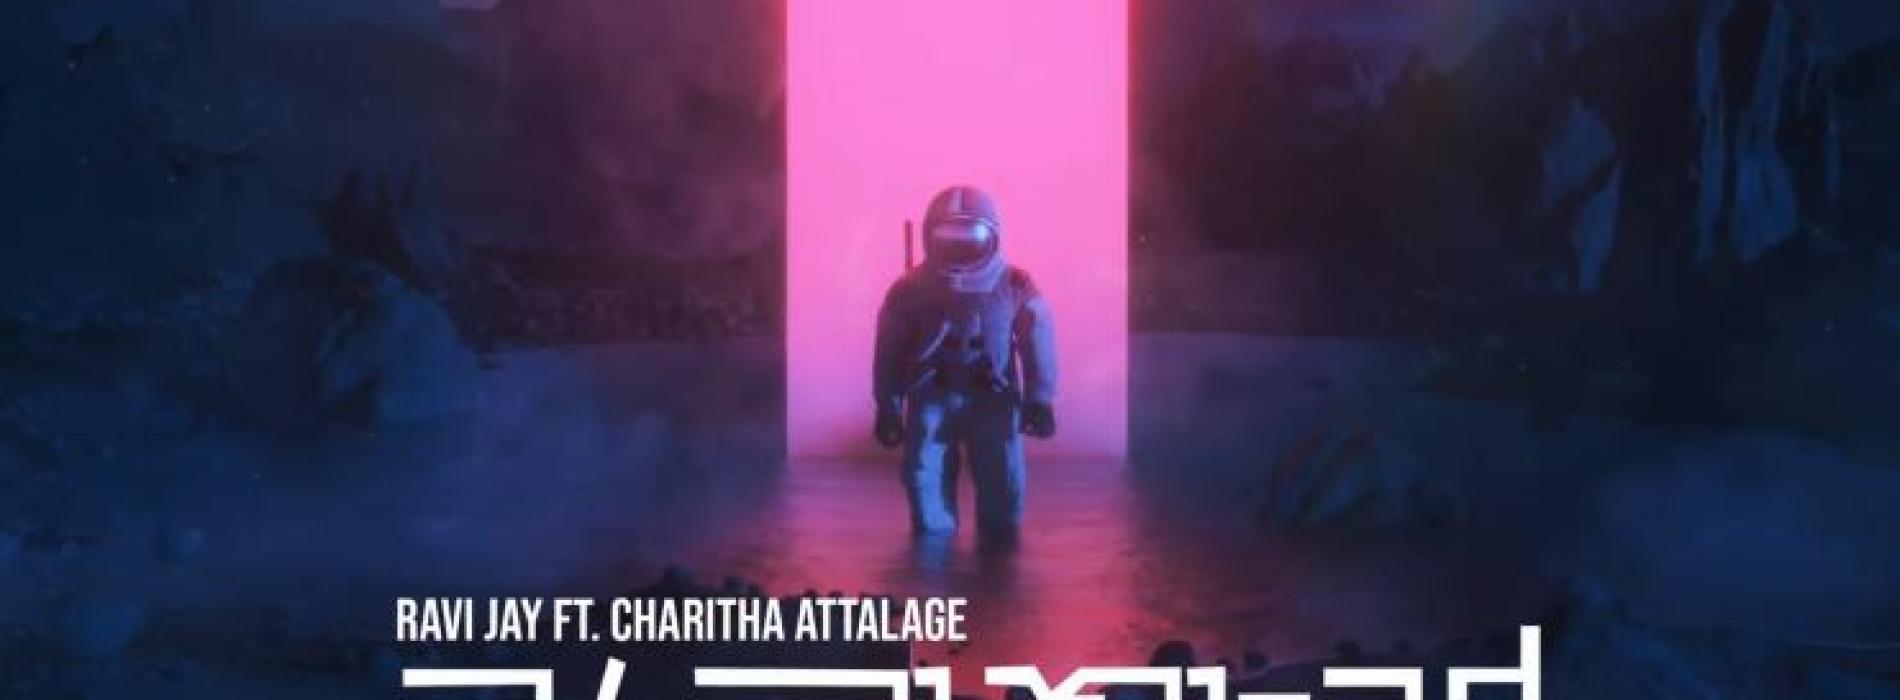 Dura Akahe (දුර ආකාහේ) (Stereomiinds Remix) – Charitha Attalage ft Ravi Jay